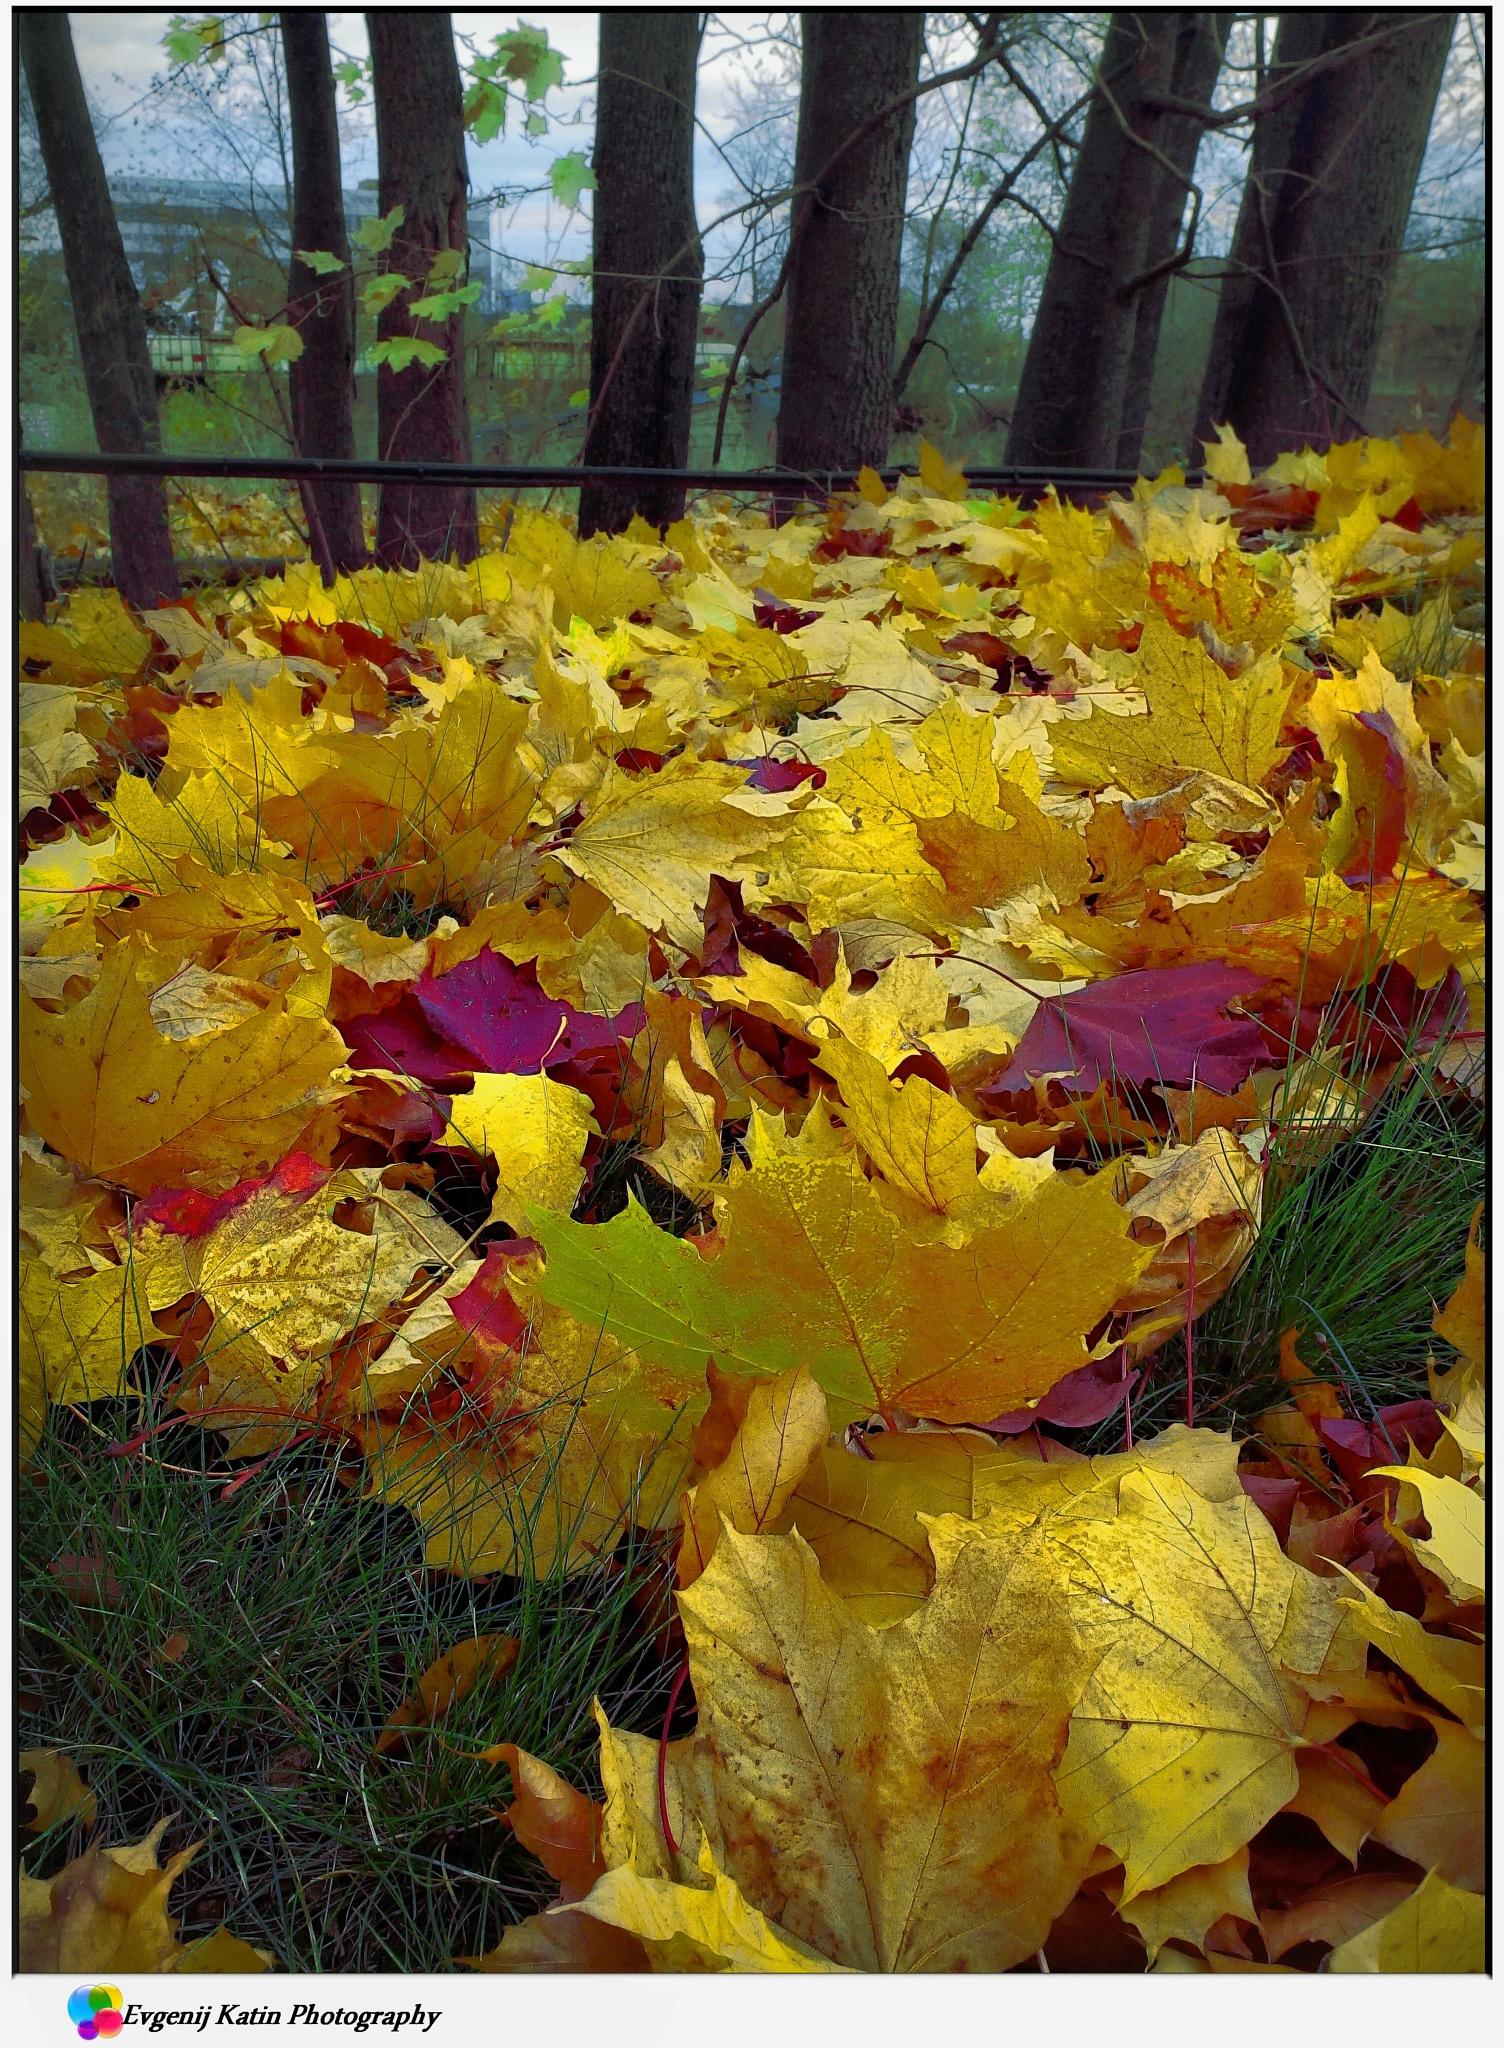 Autumn flush by Evgenij Katin